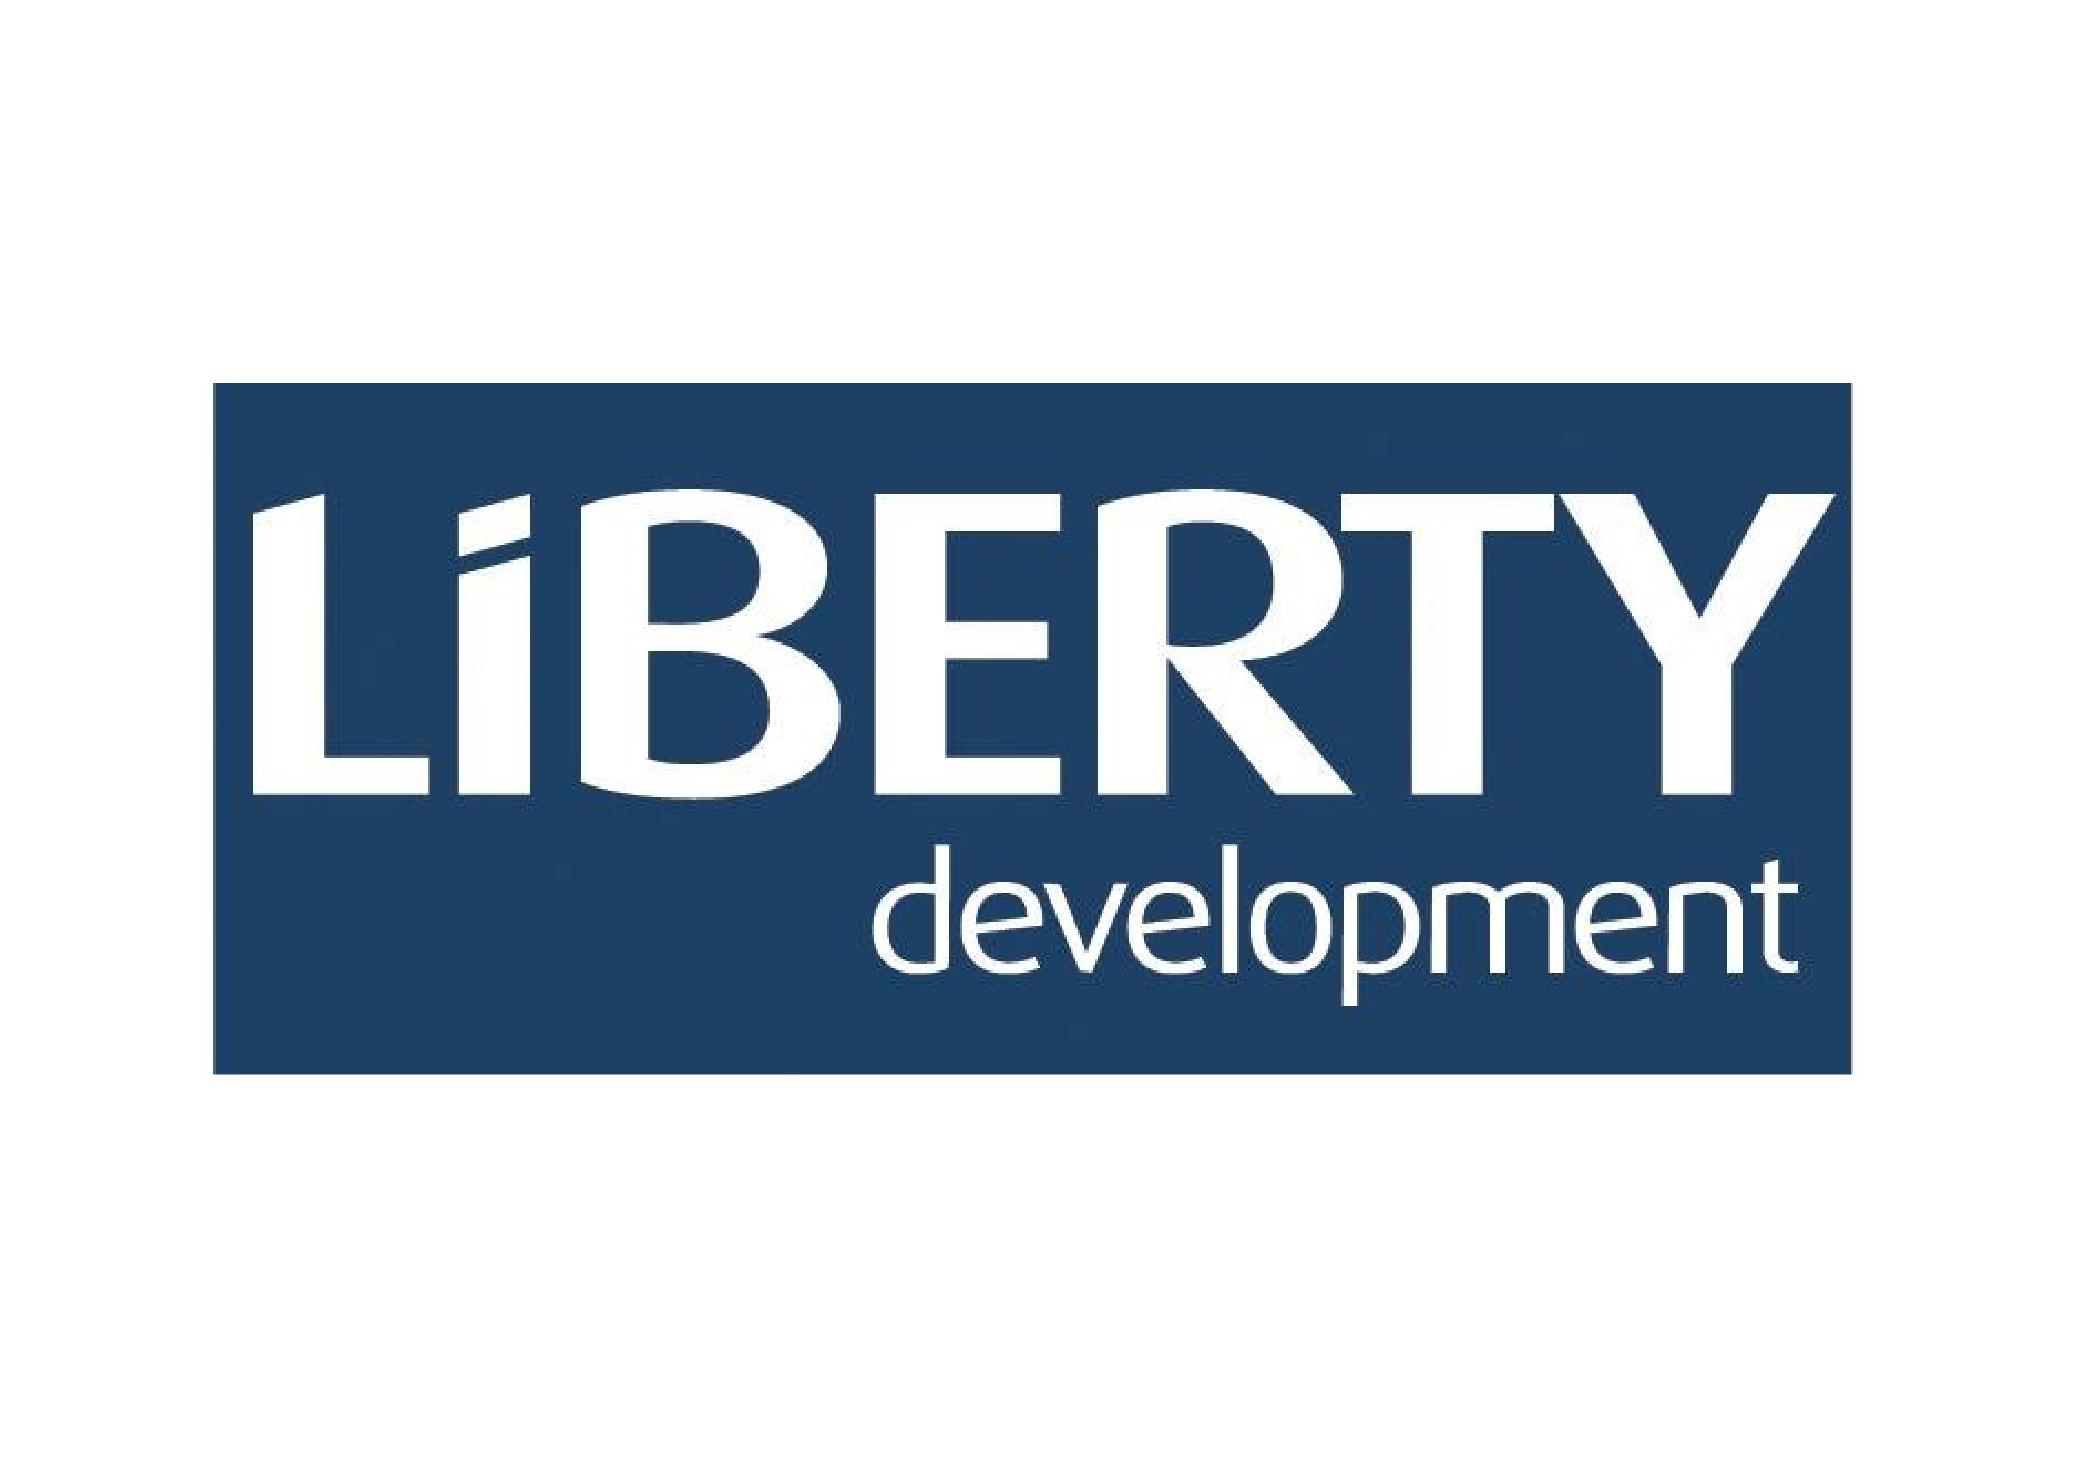 Liberty Developments